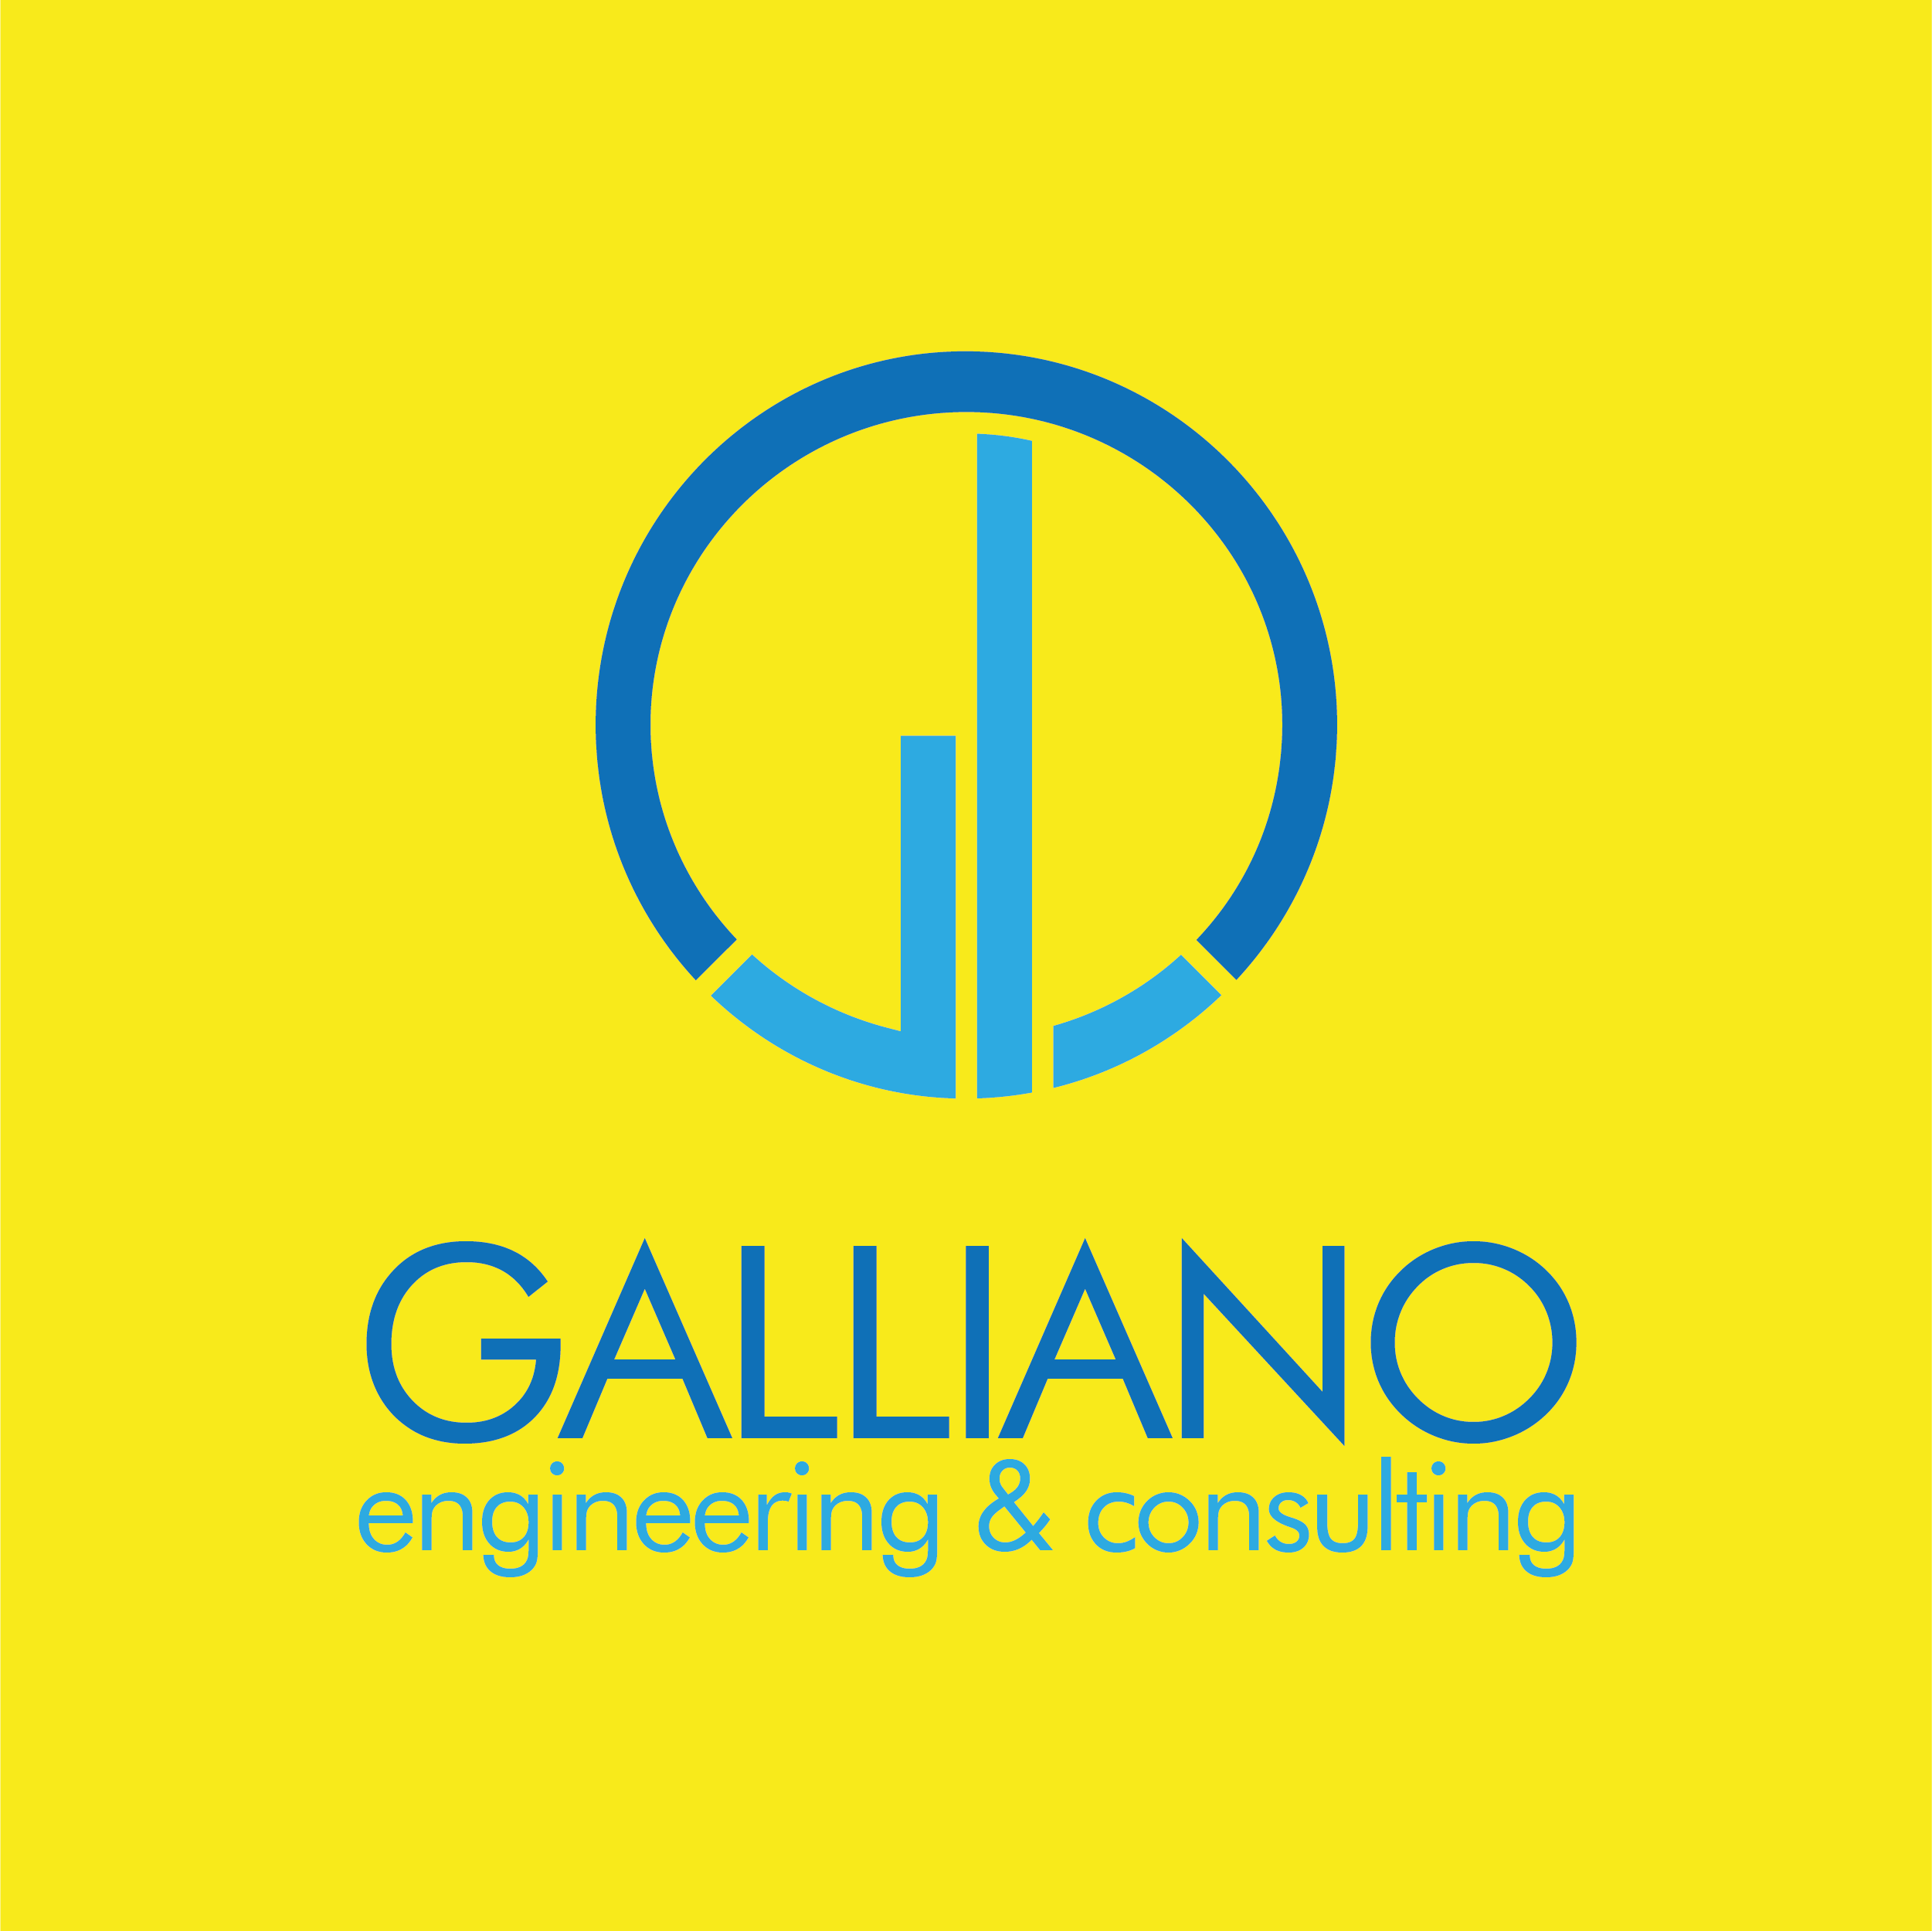 logo galliano engineering